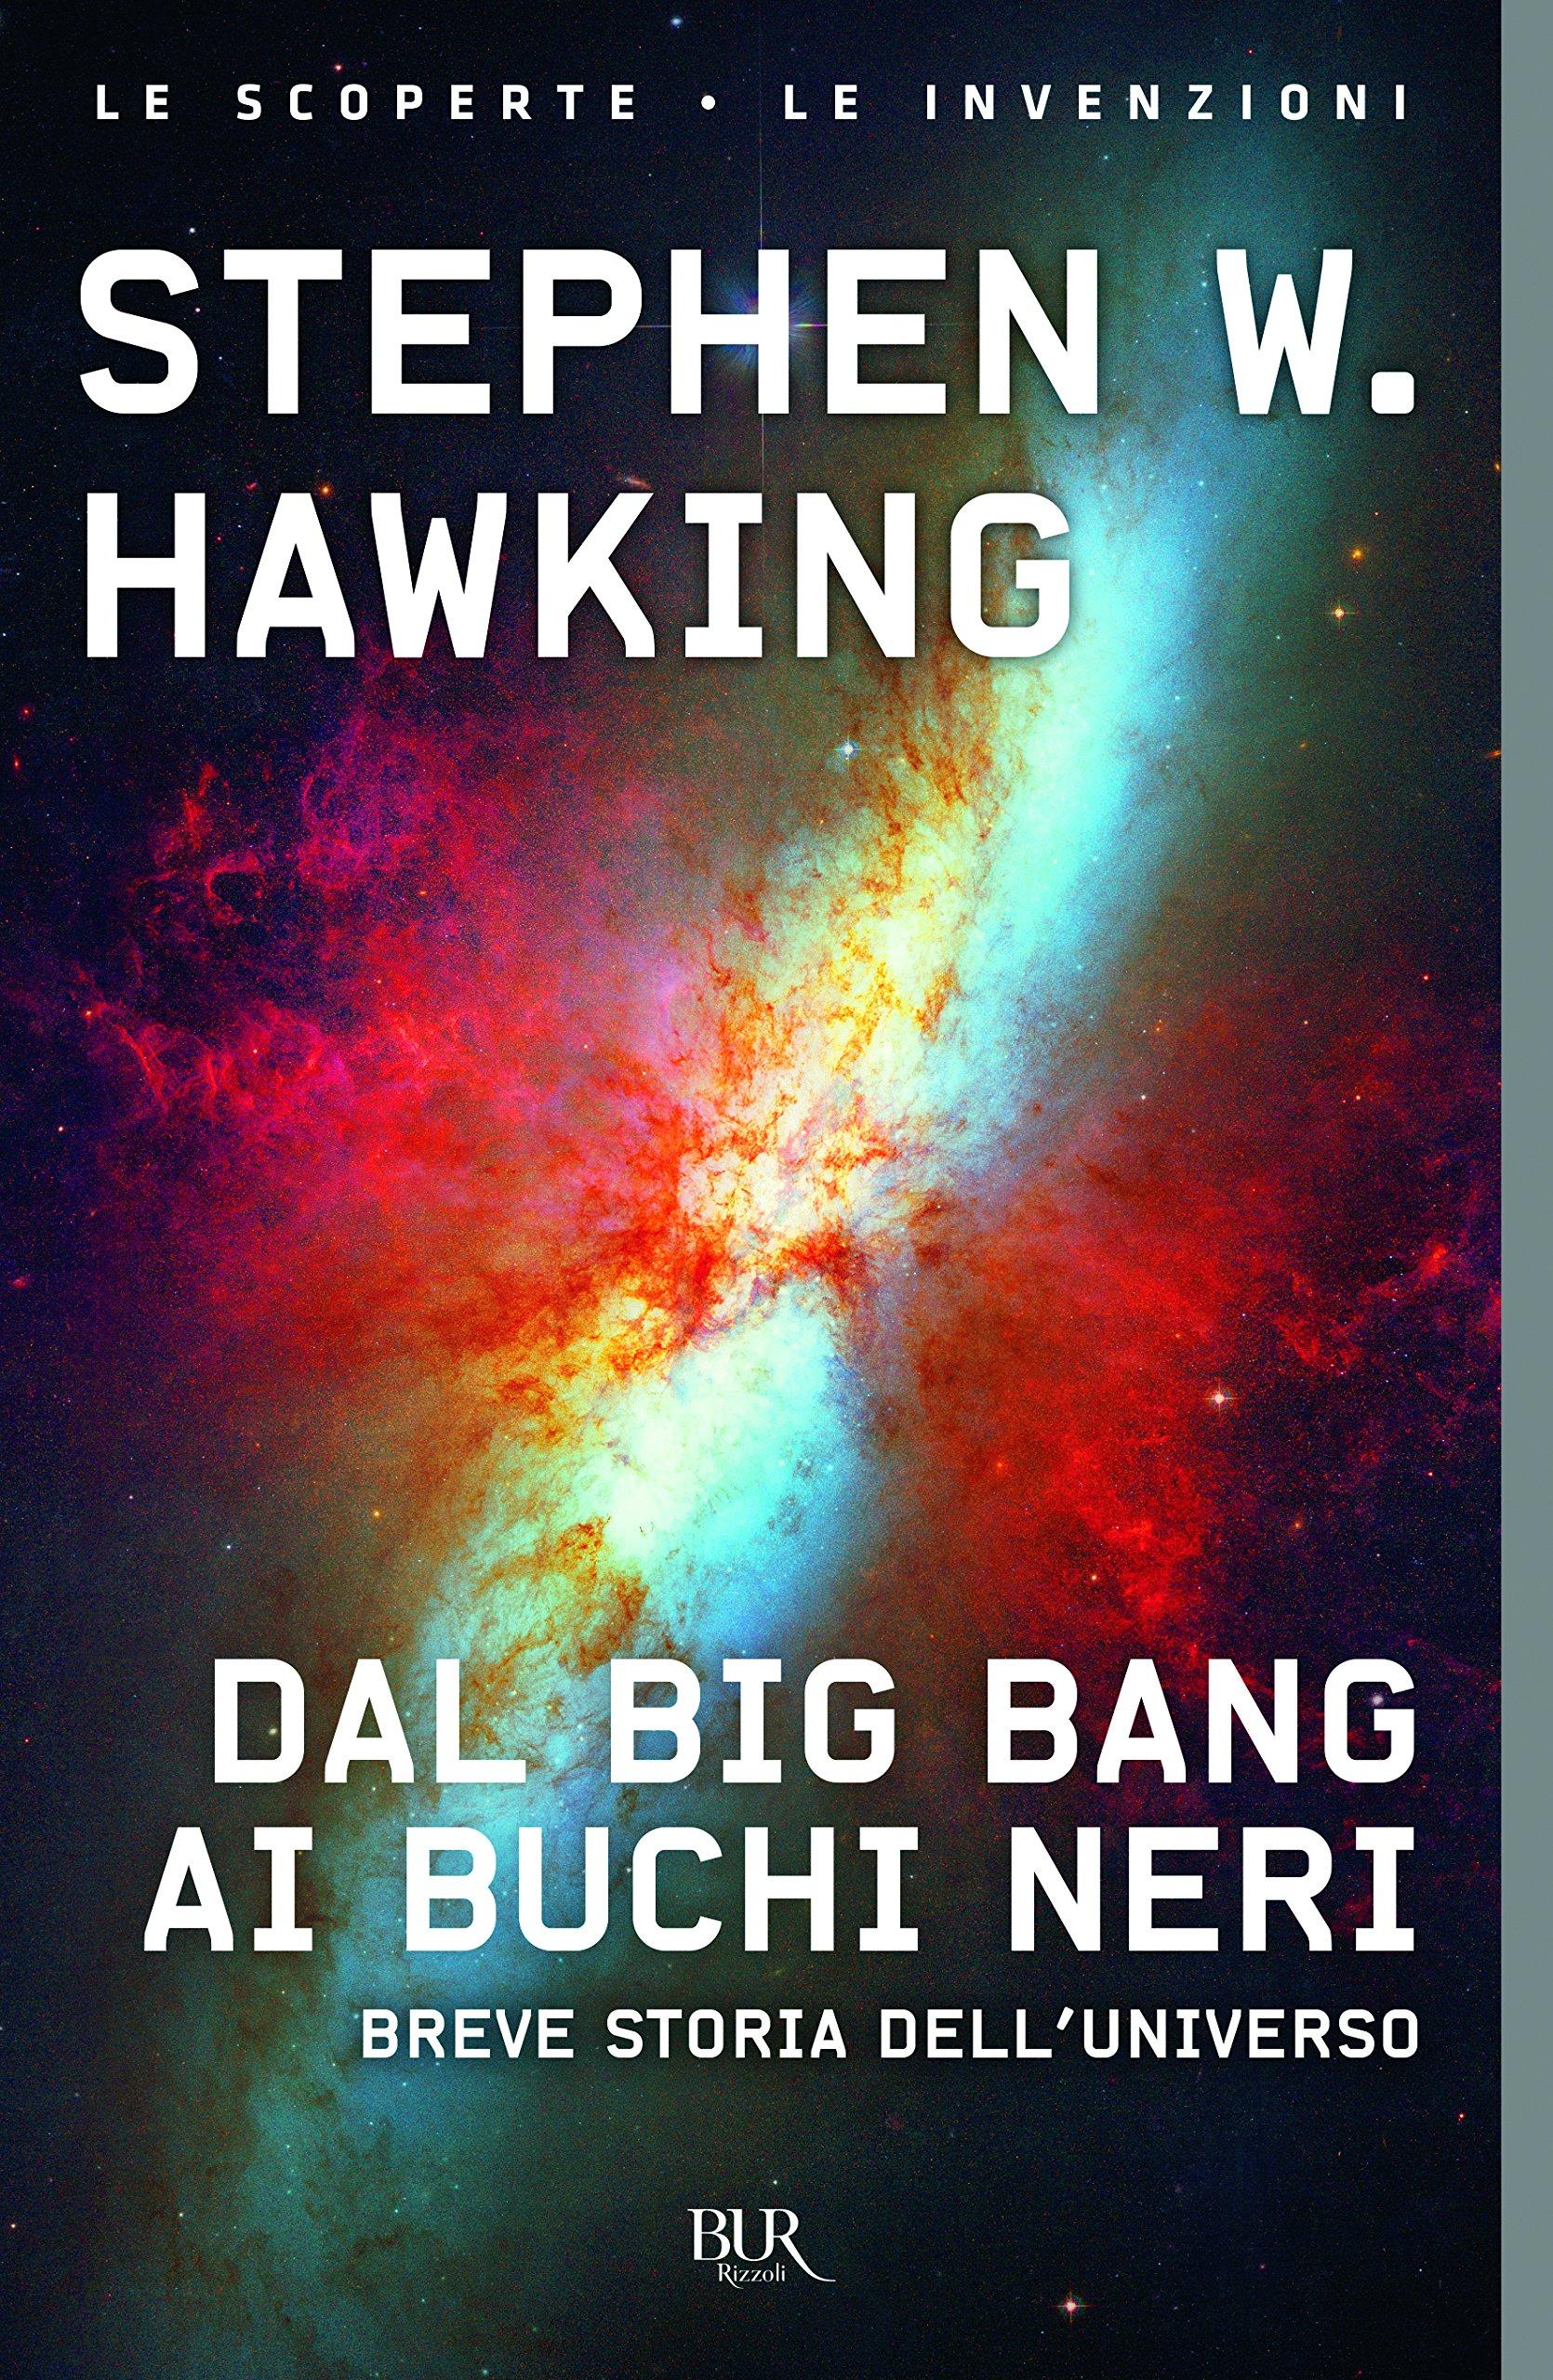 Copertina Libro Dal big bang ai buchi neri